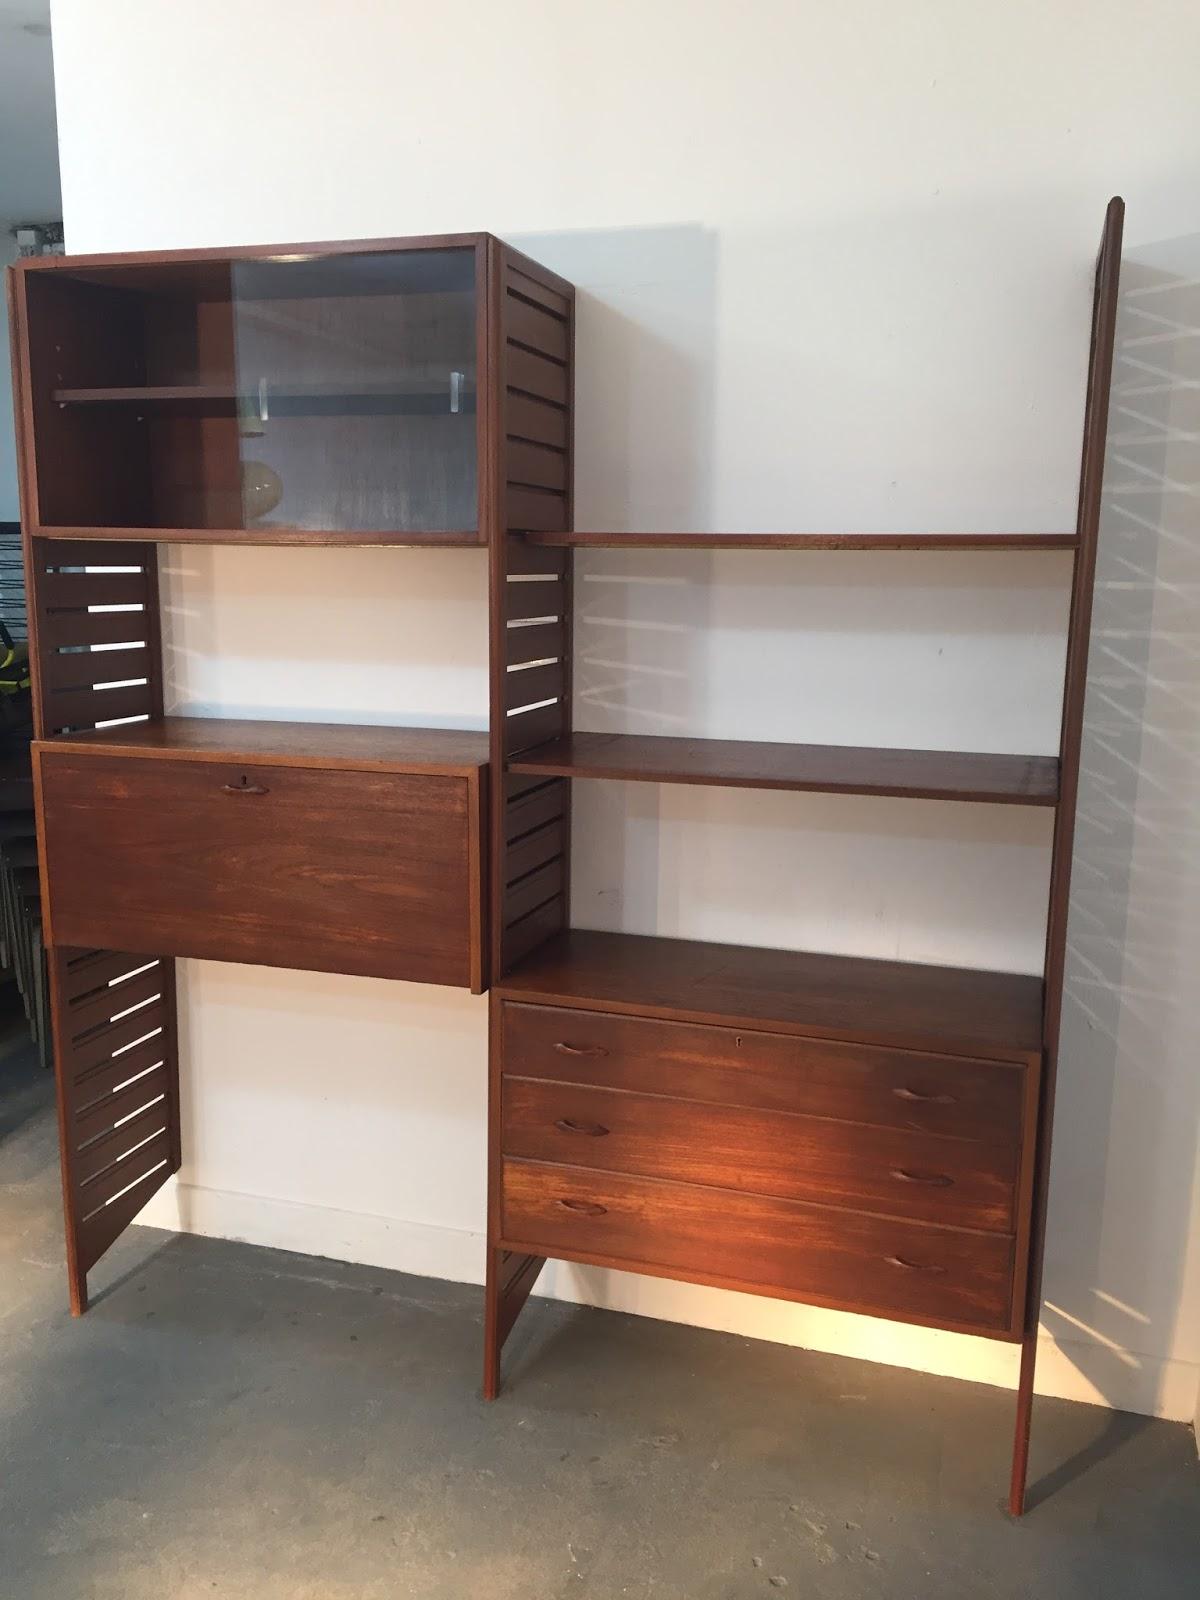 parker knoll sofa bed modern linen slipcover ocd - vintage furniture ireland